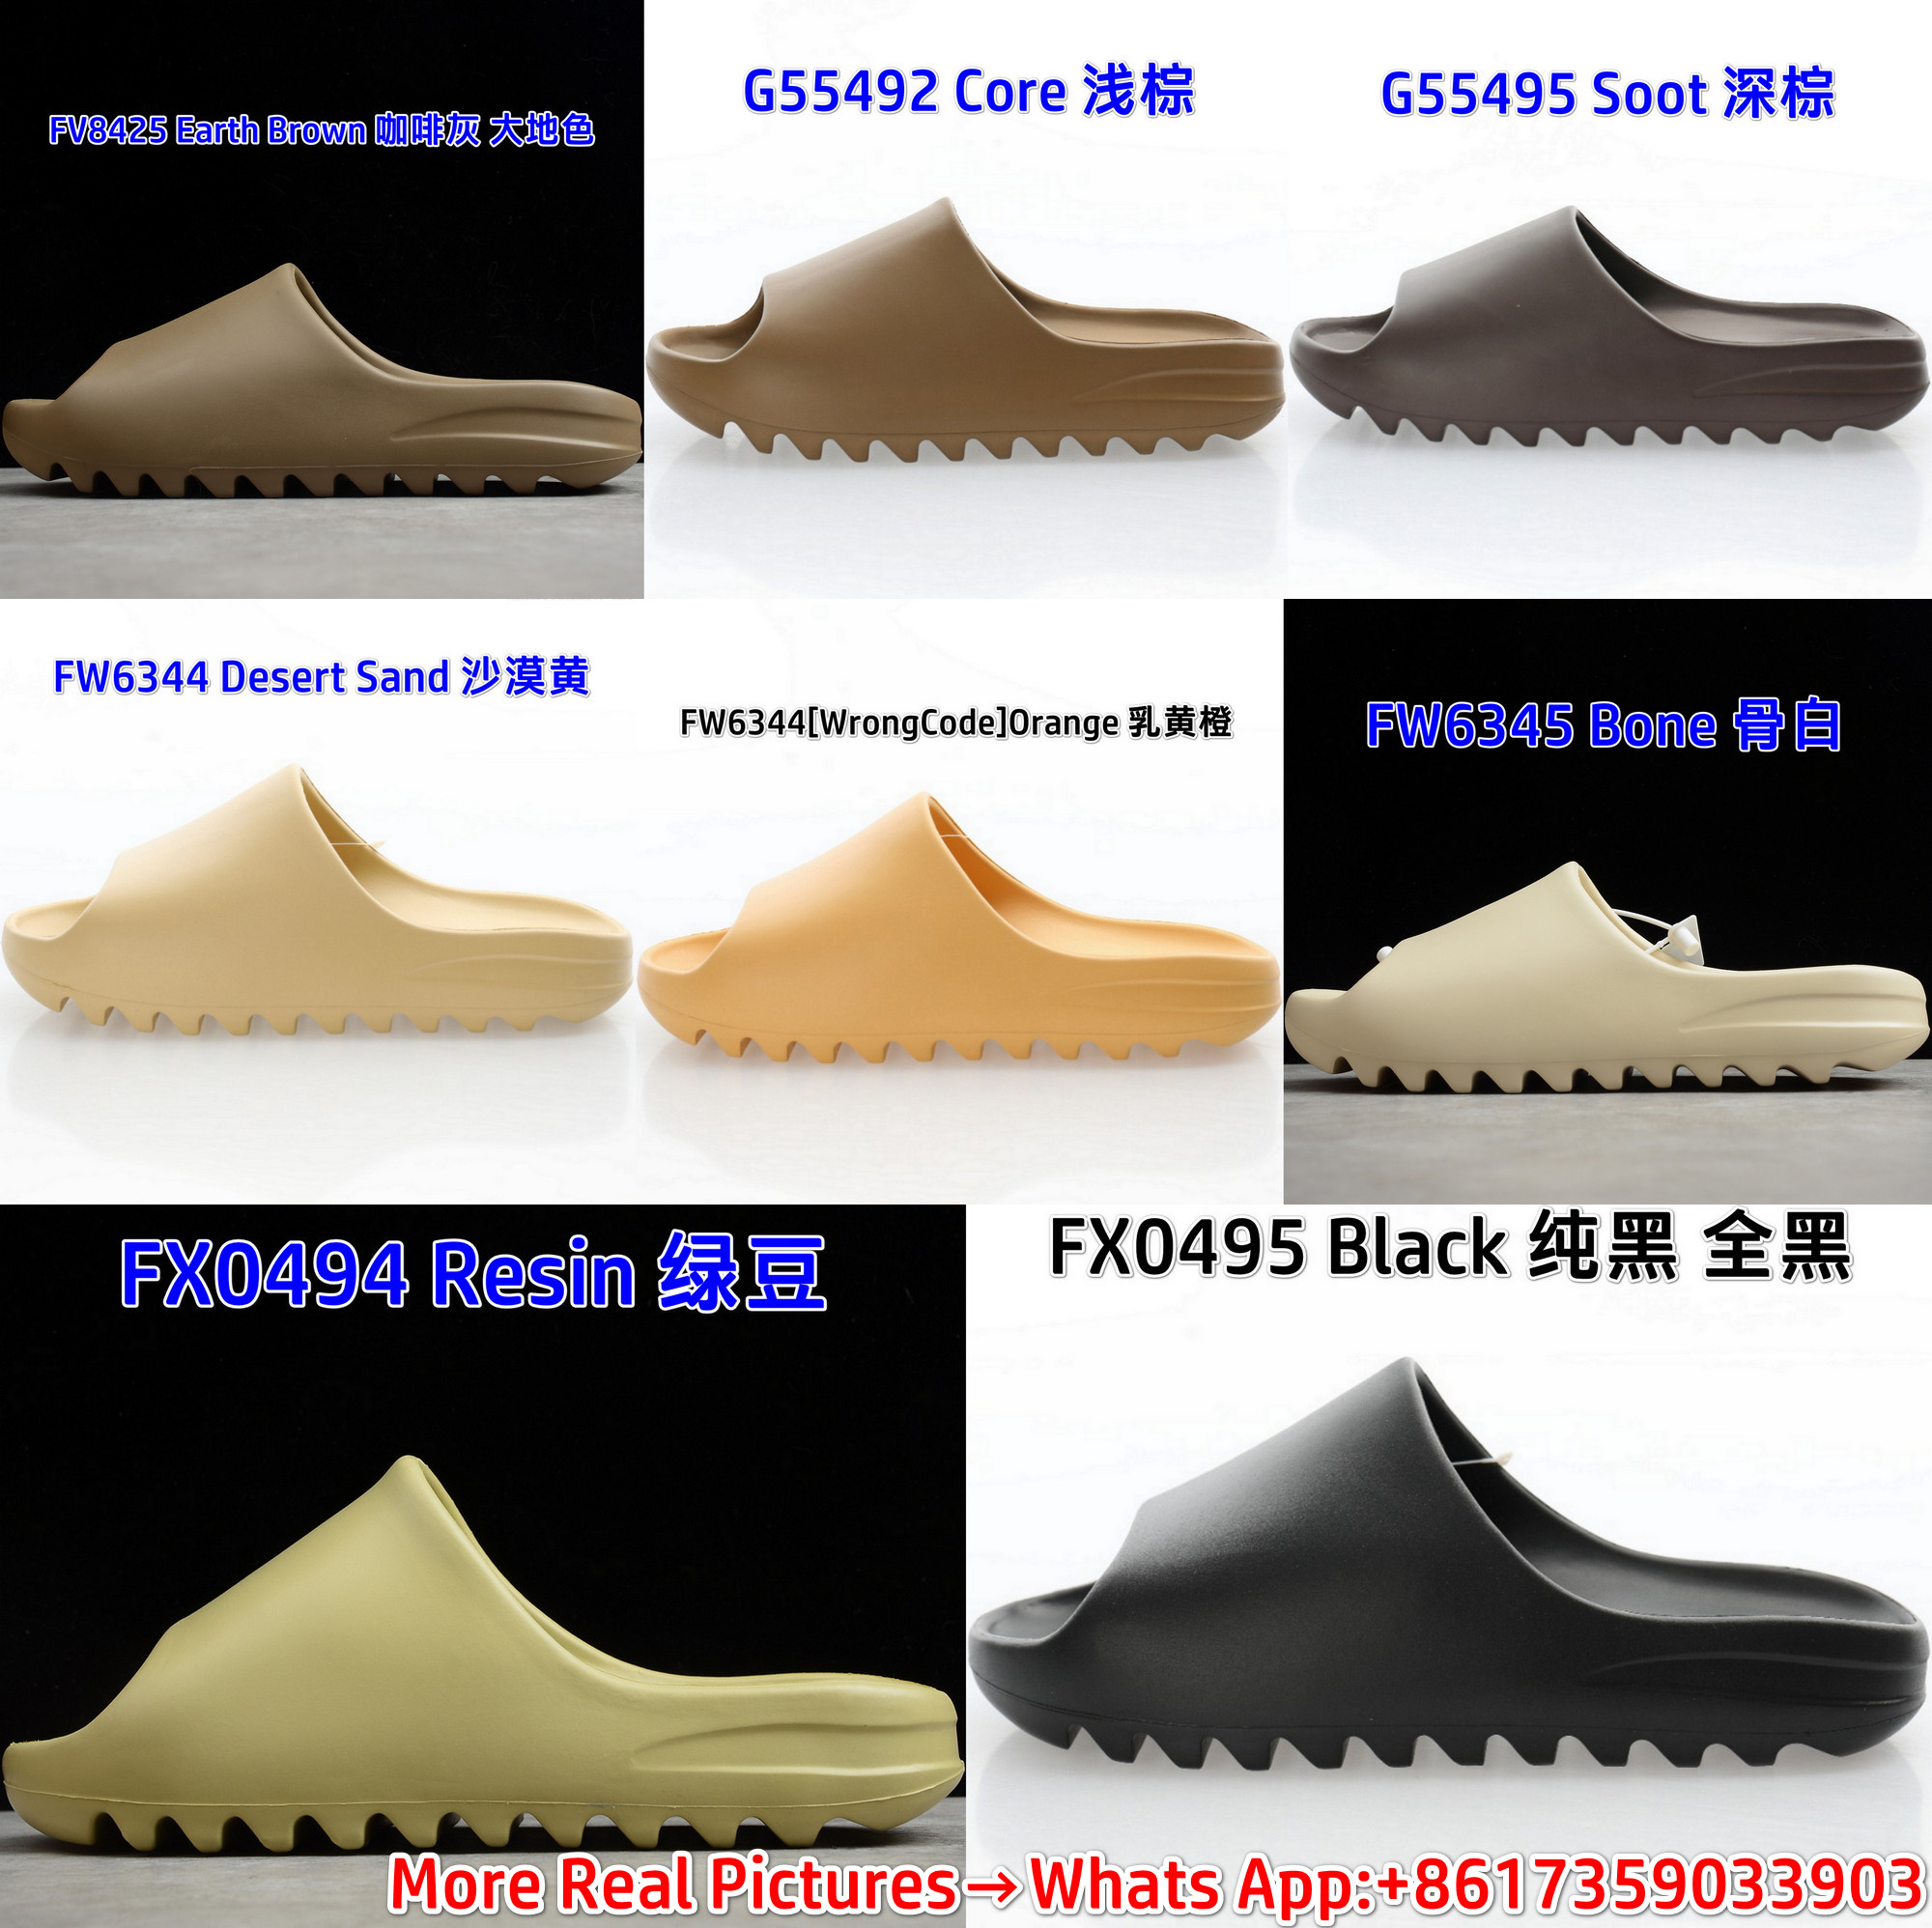 Сандалии на шнурках FV8425 Earth Brown FW6344 Desert Sand Orange FW6345 Bone FX0494 Resin FX0495 Black G55492 Core G55495 Soot